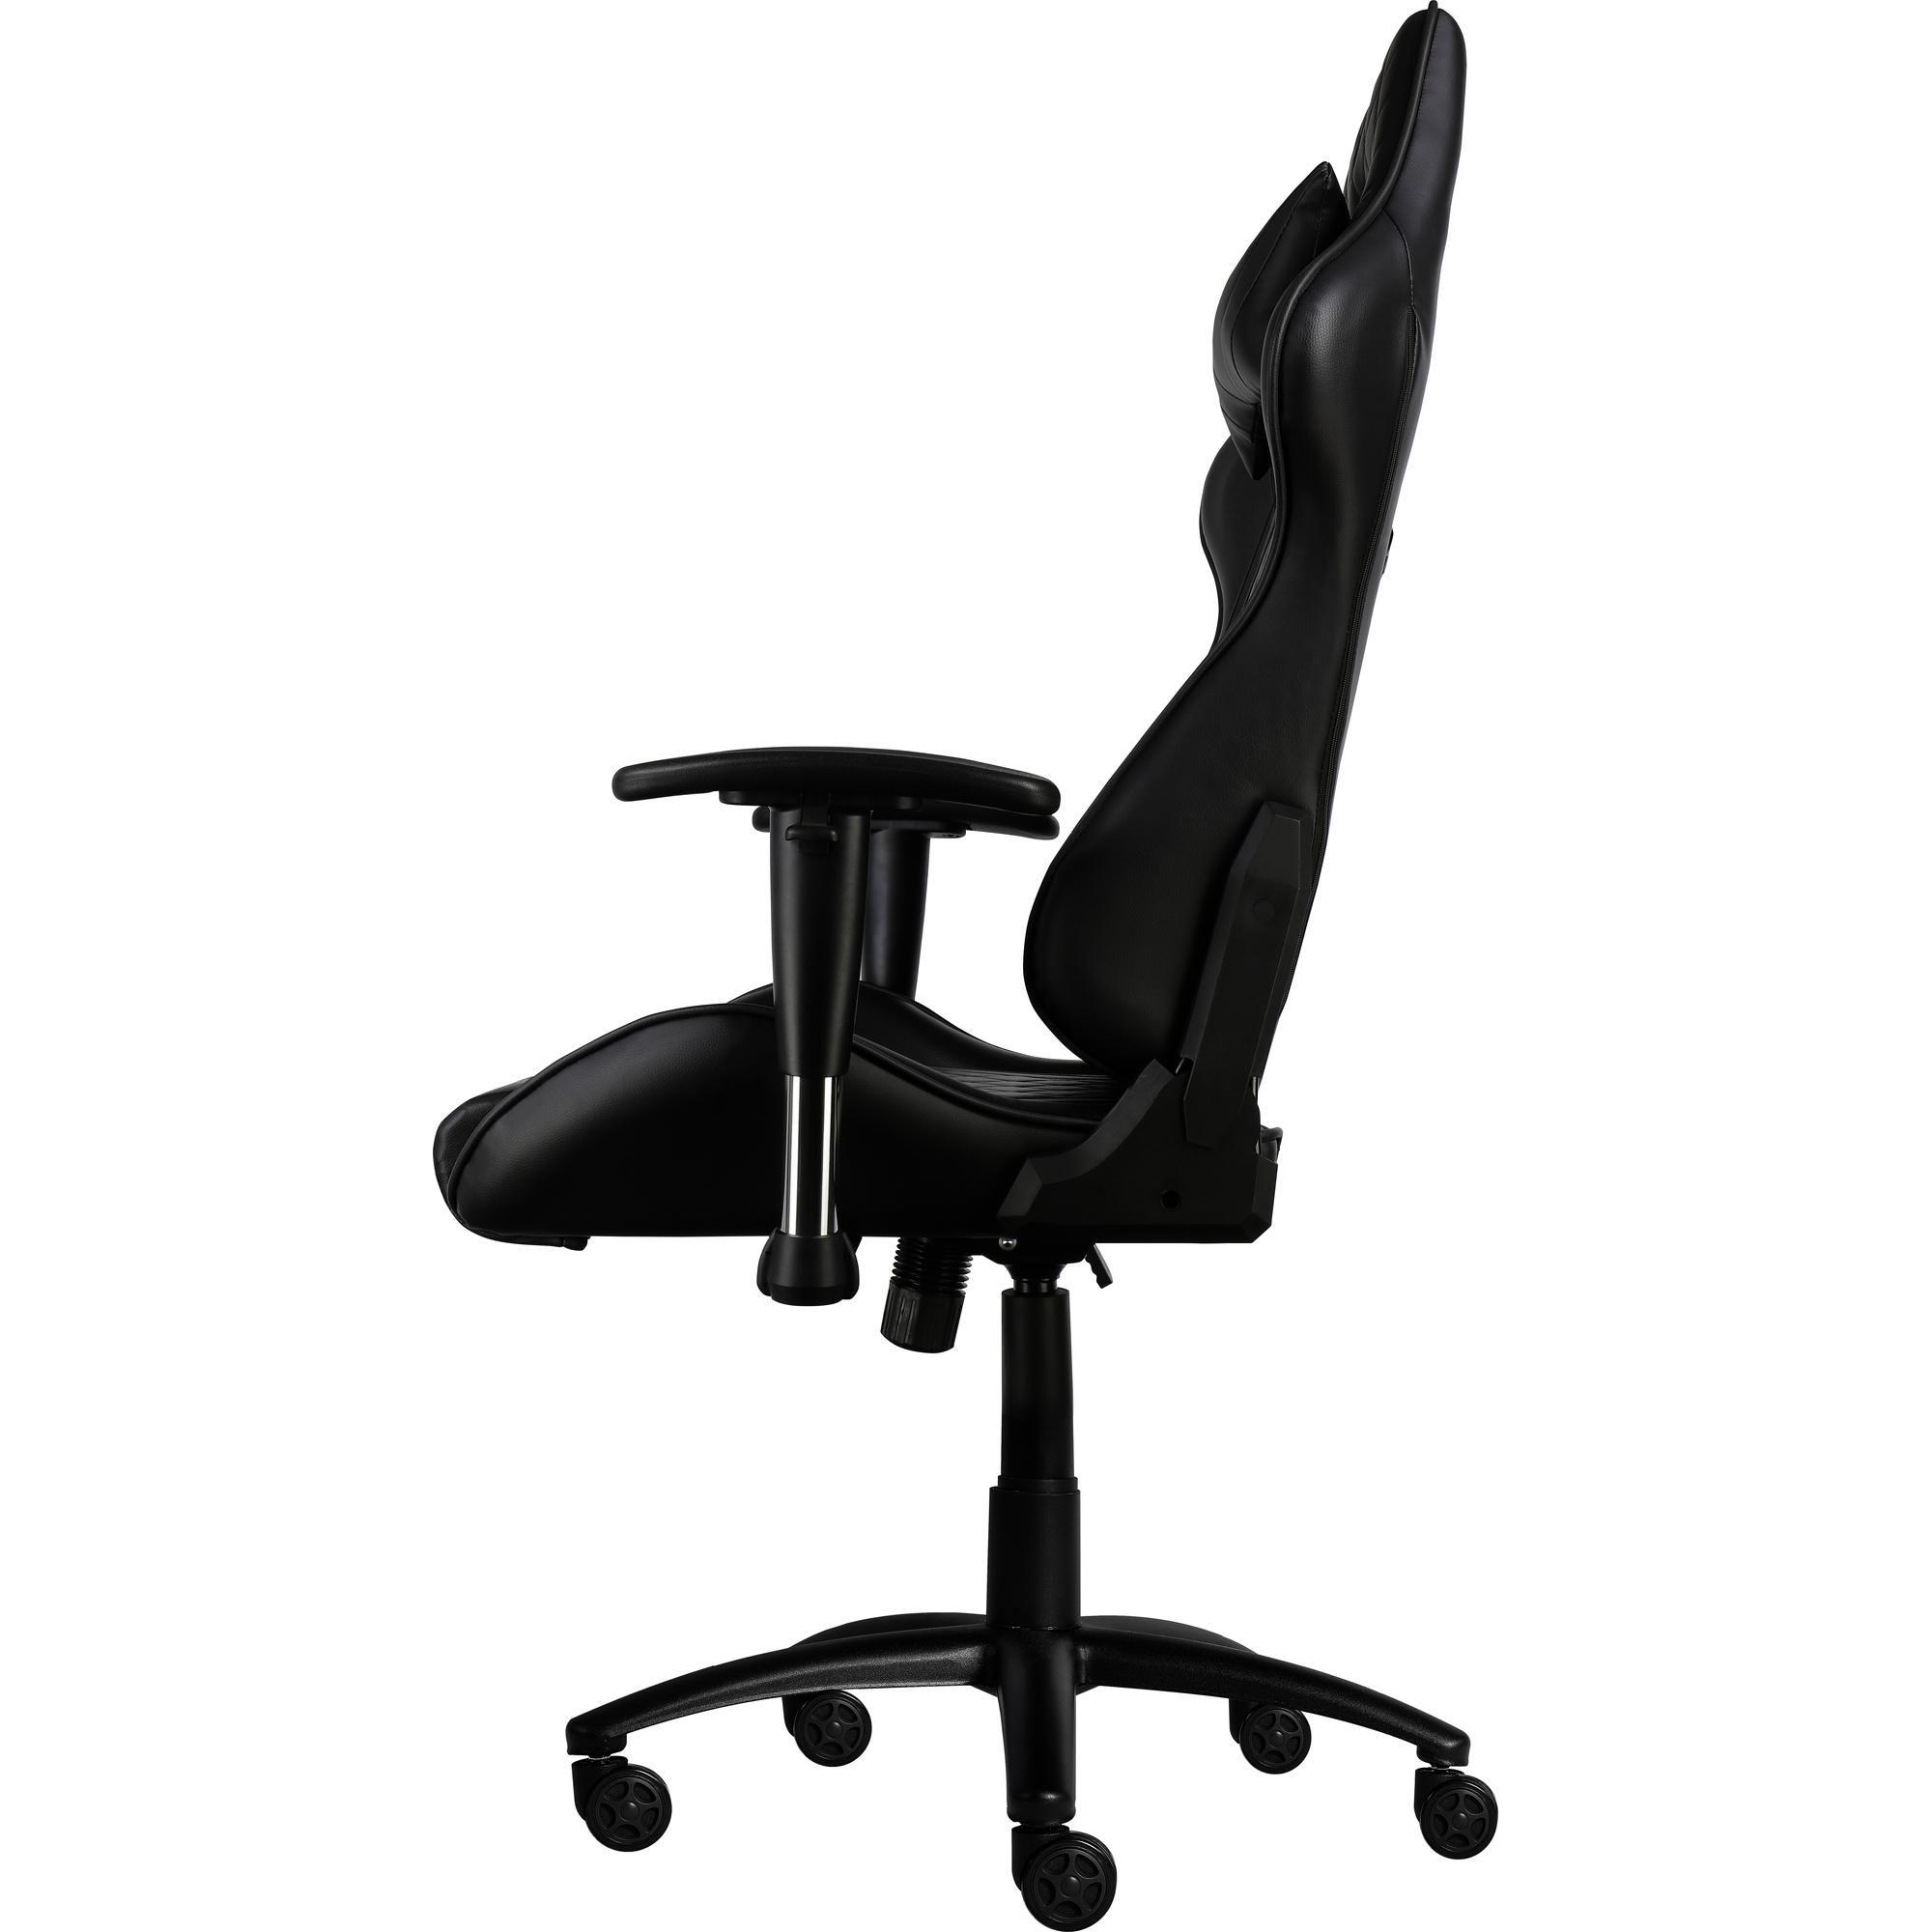 Cadeira Gamer Profissional TGC15 Preta THUNDERX3